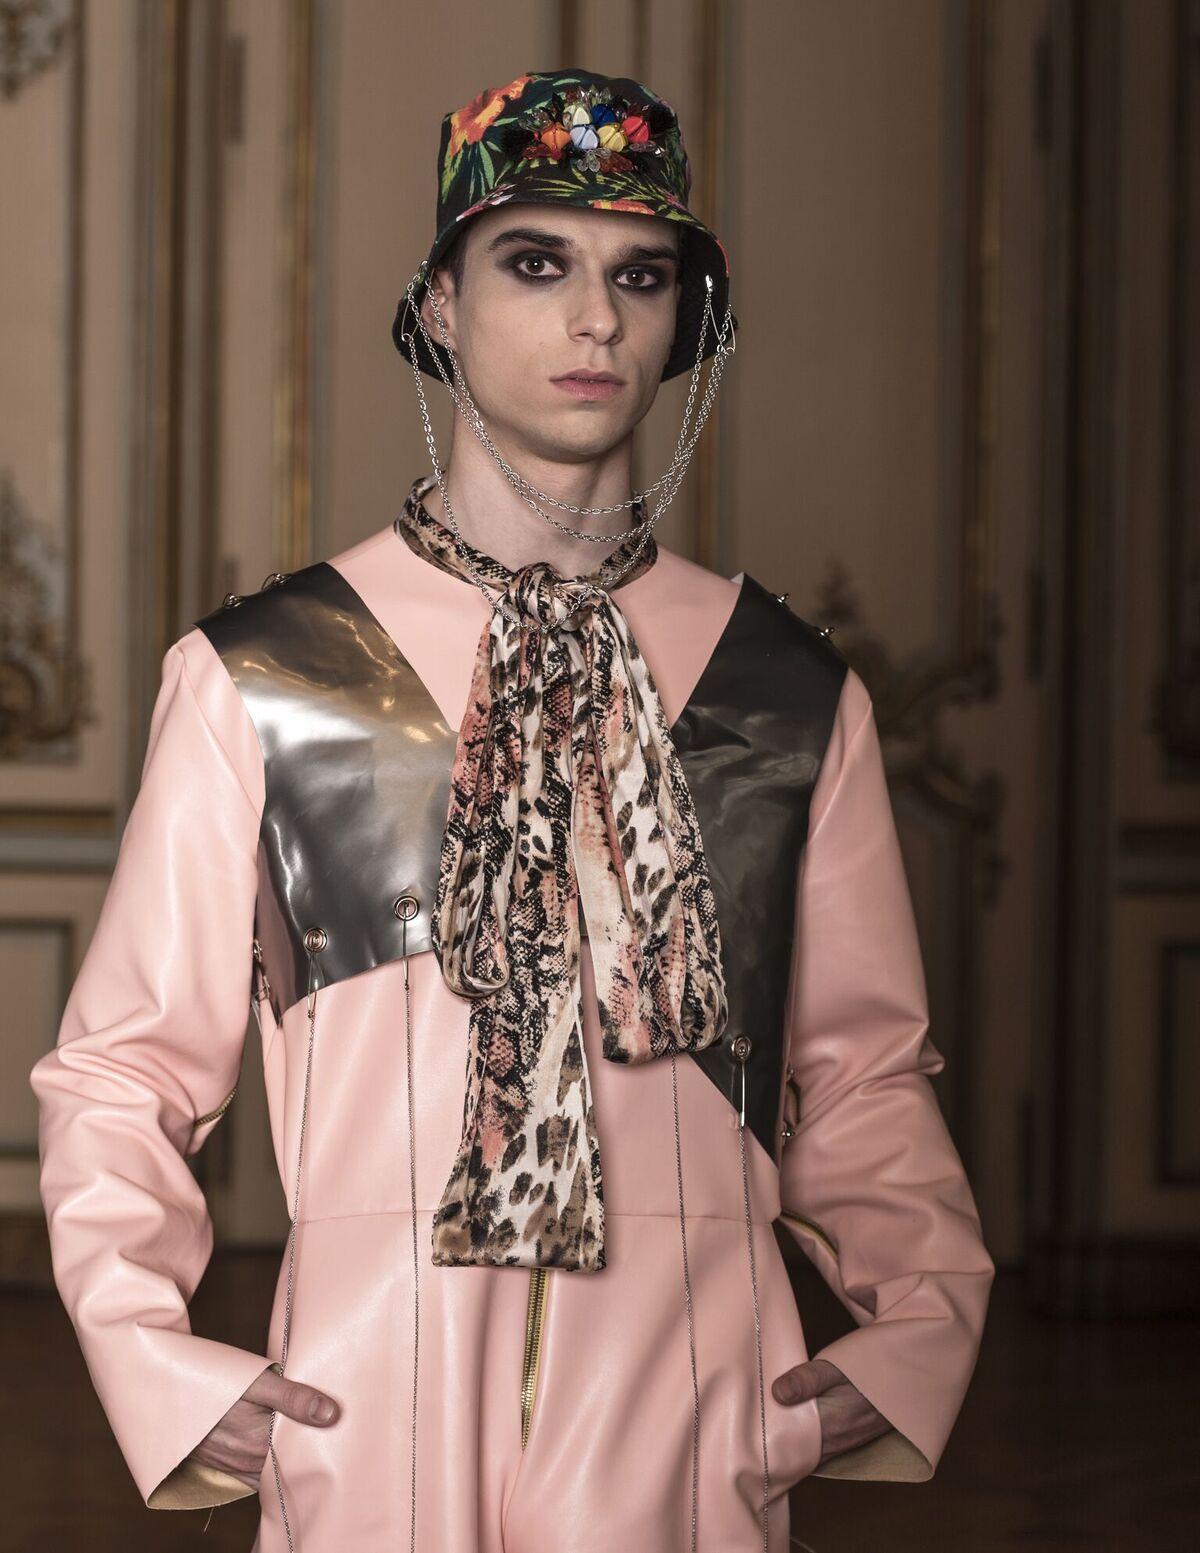 Shaleva freedom ss20 during paris fashion week (11)